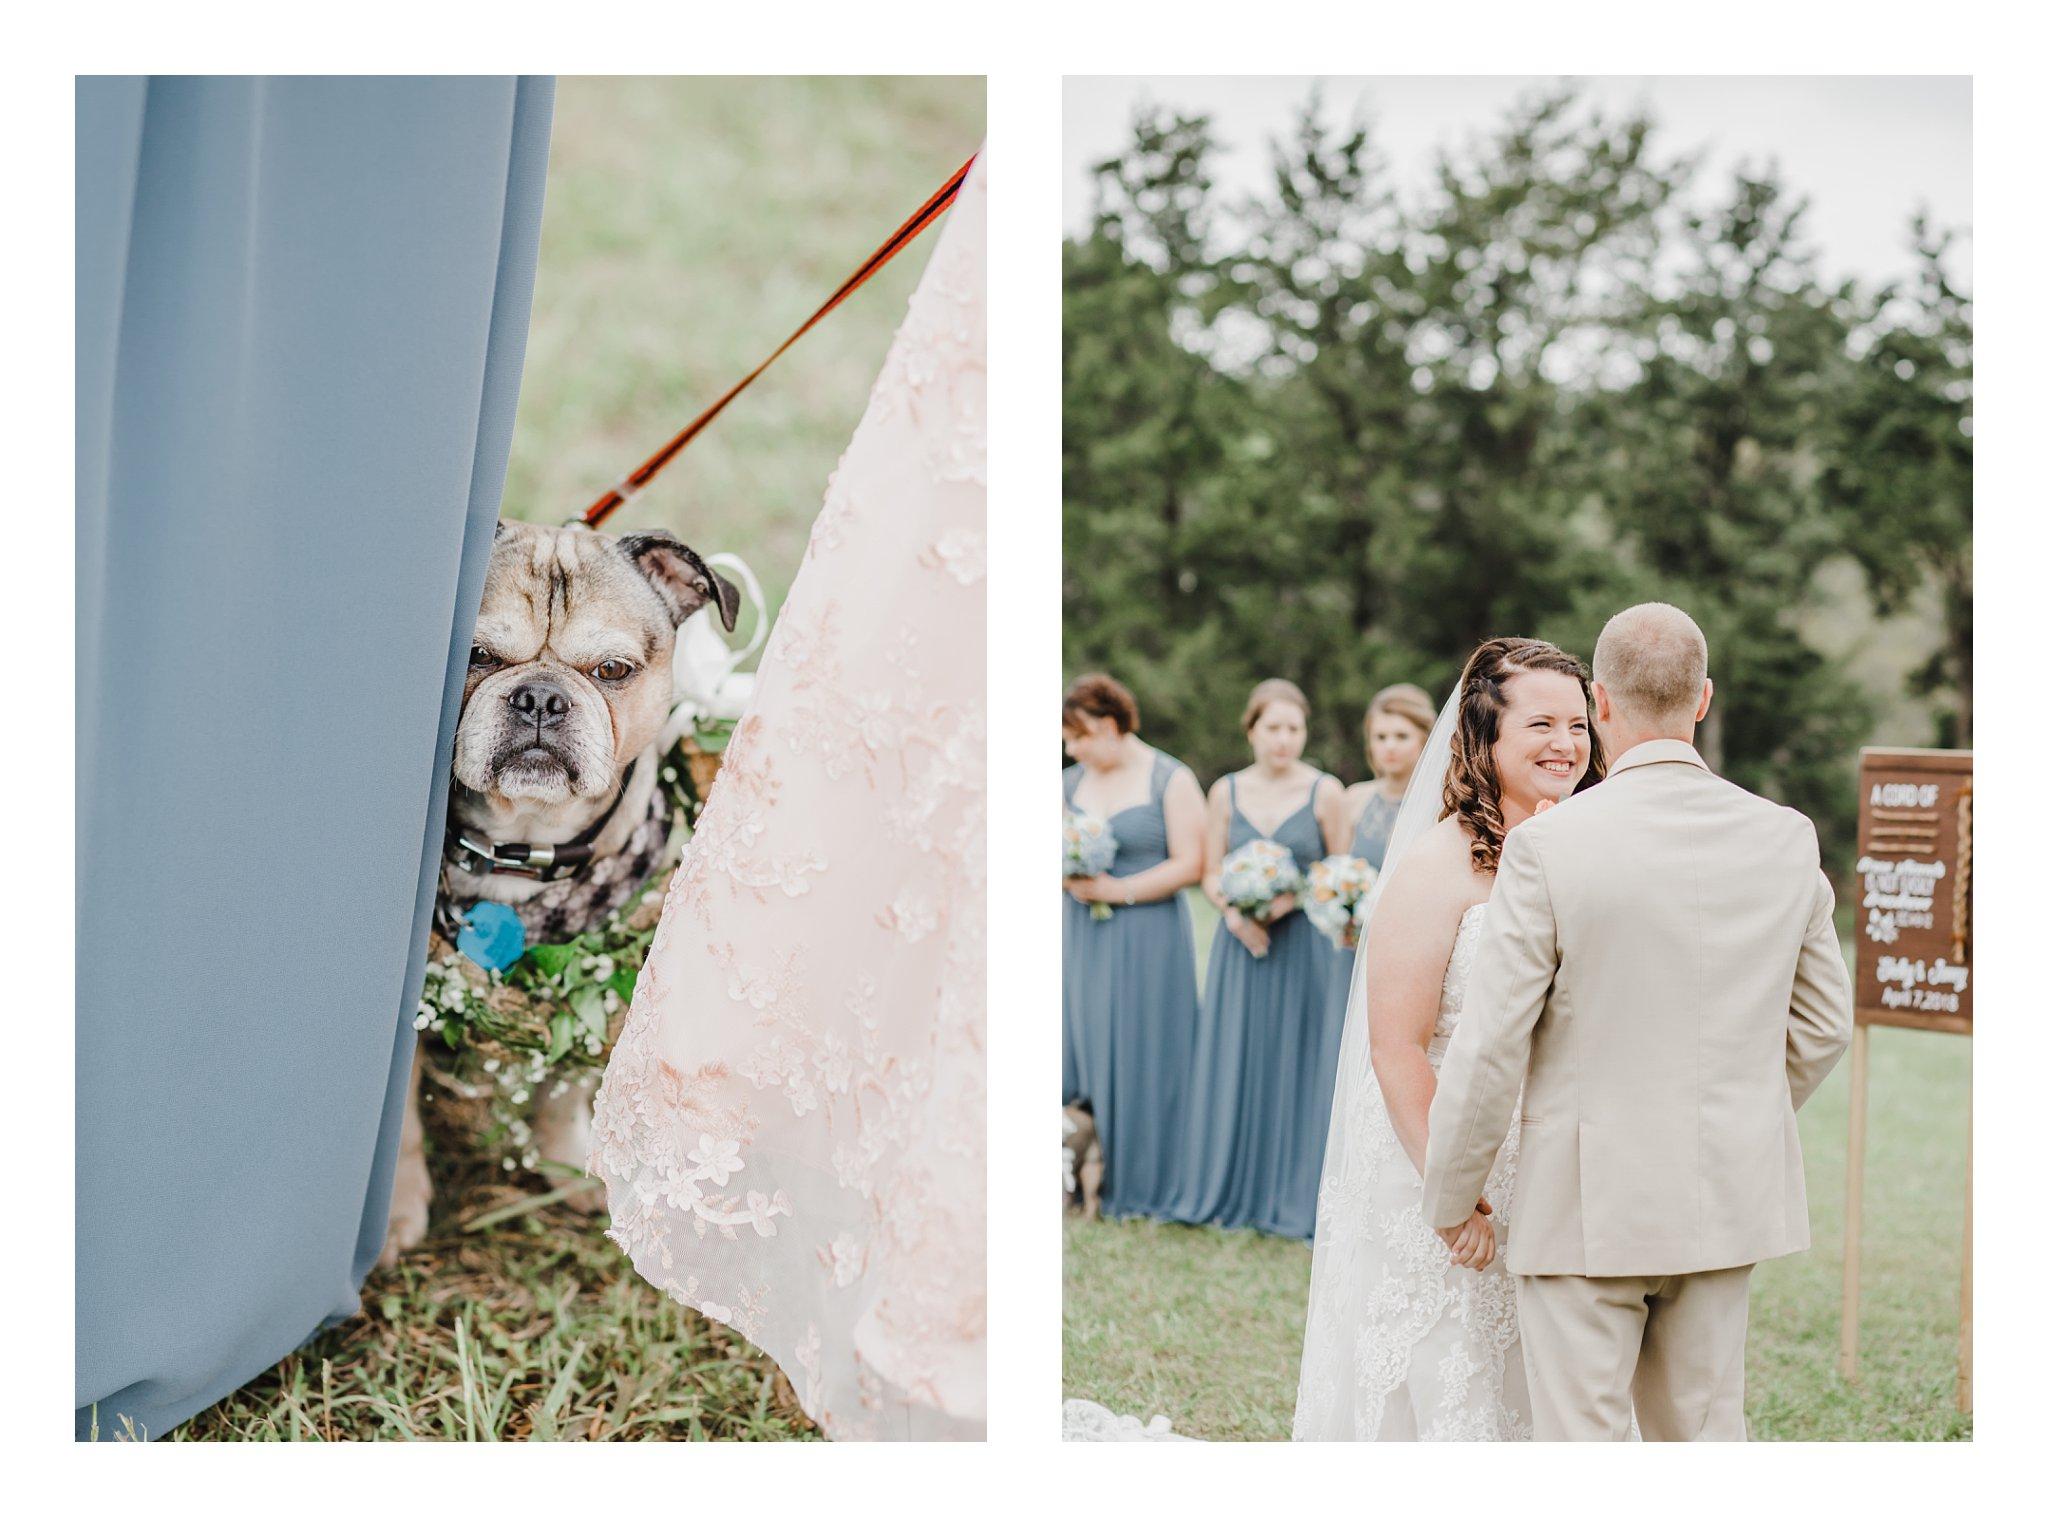 steel-blue-blush-spring-lace-gown-newberry-sc-wedding-photos-_0030.jpg